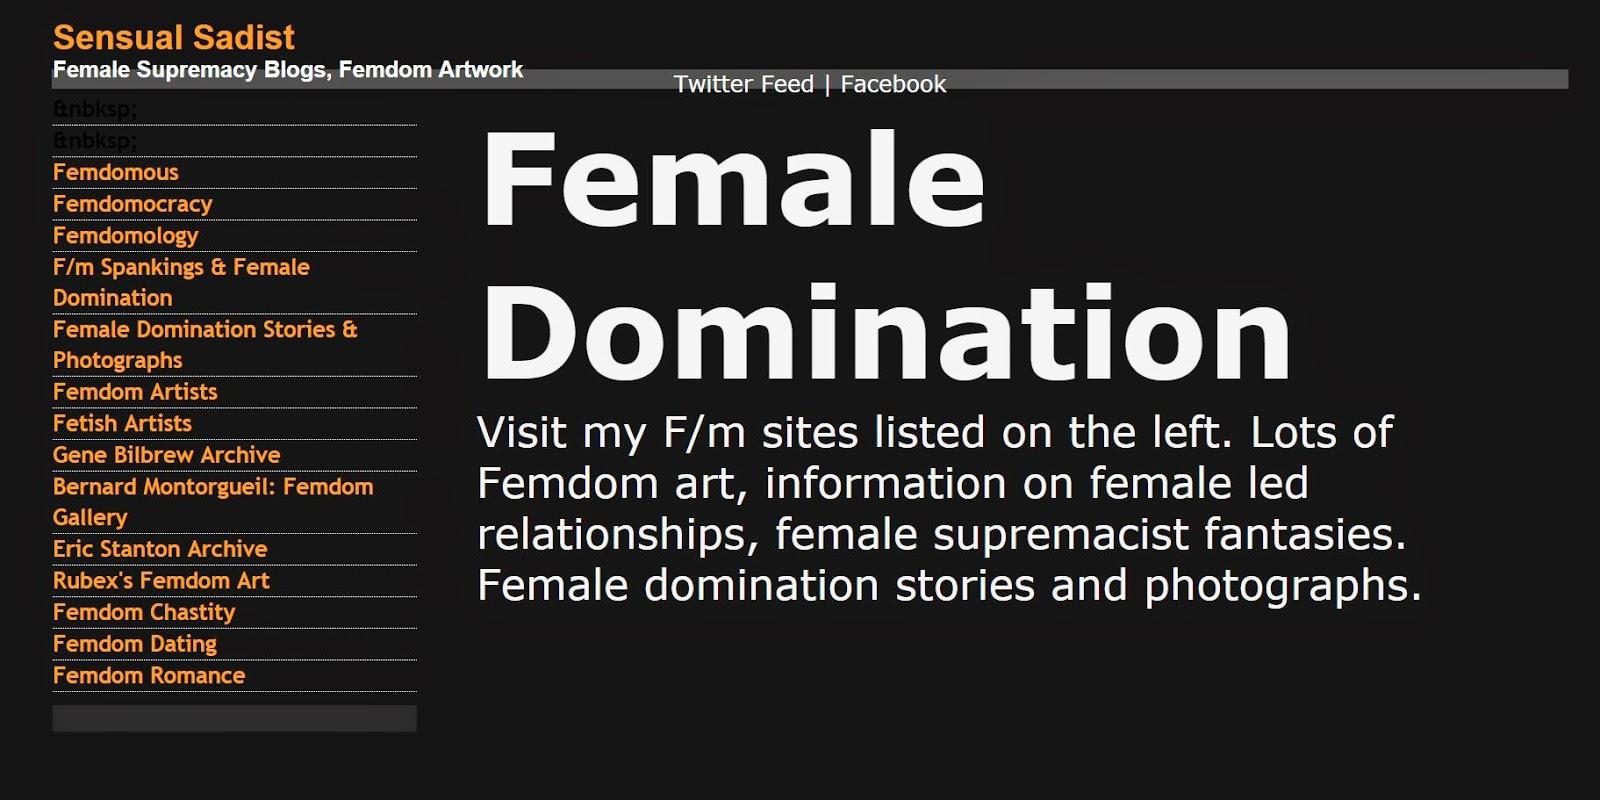 http://www.sensualsadist.com/